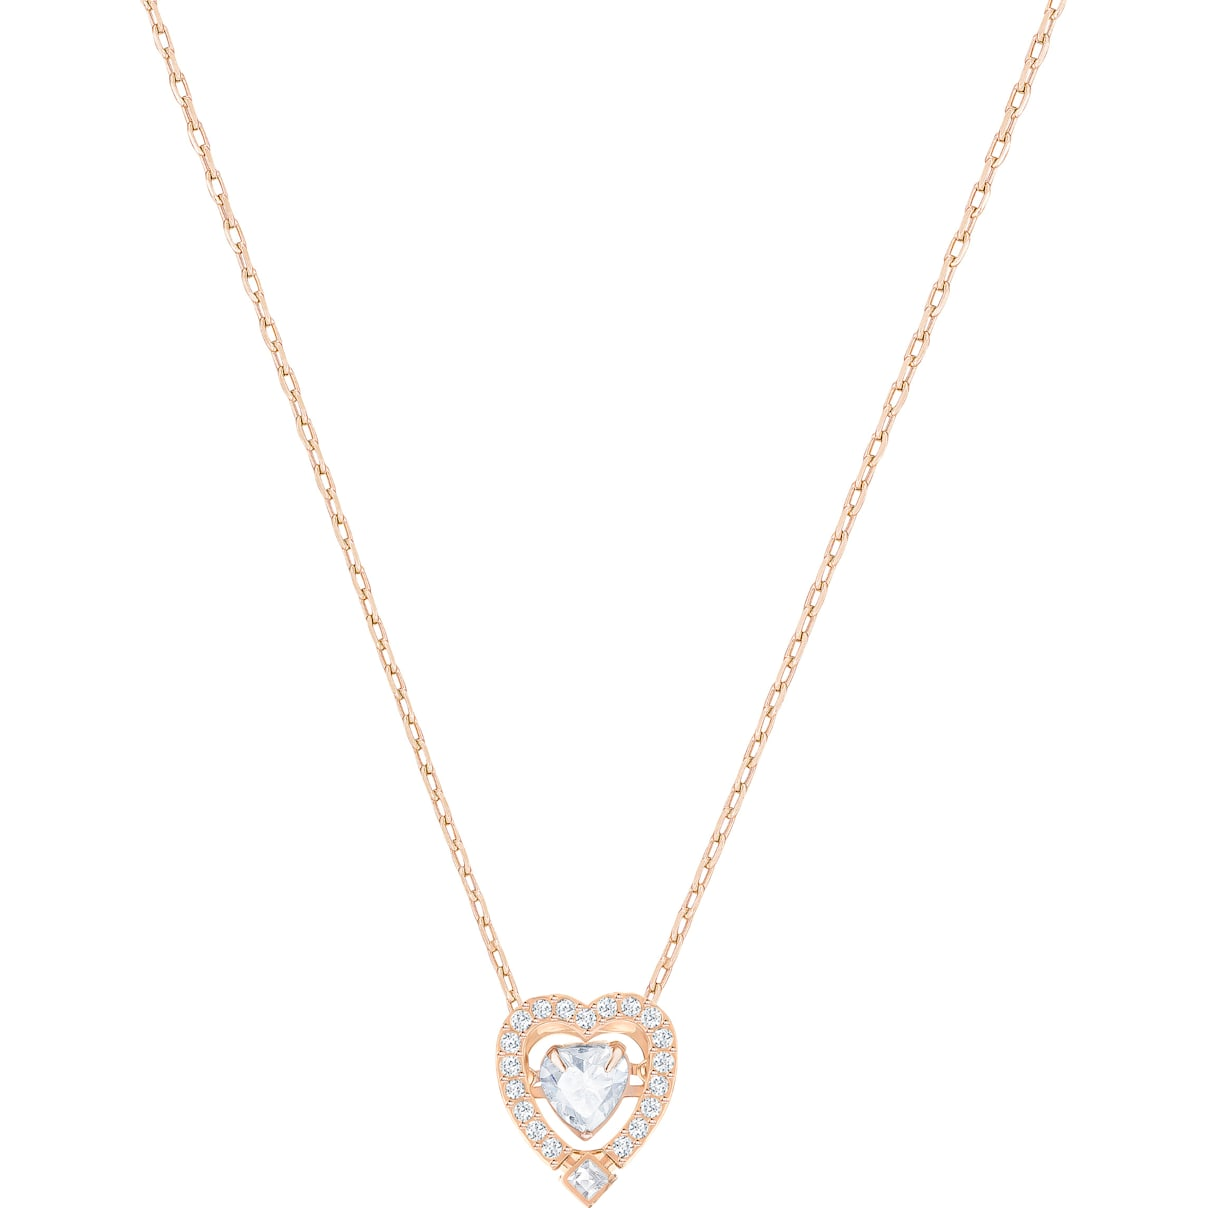 Swarovski Swarovski Sparkling Dance Heart Necklace, White, Rose-gold tone plated